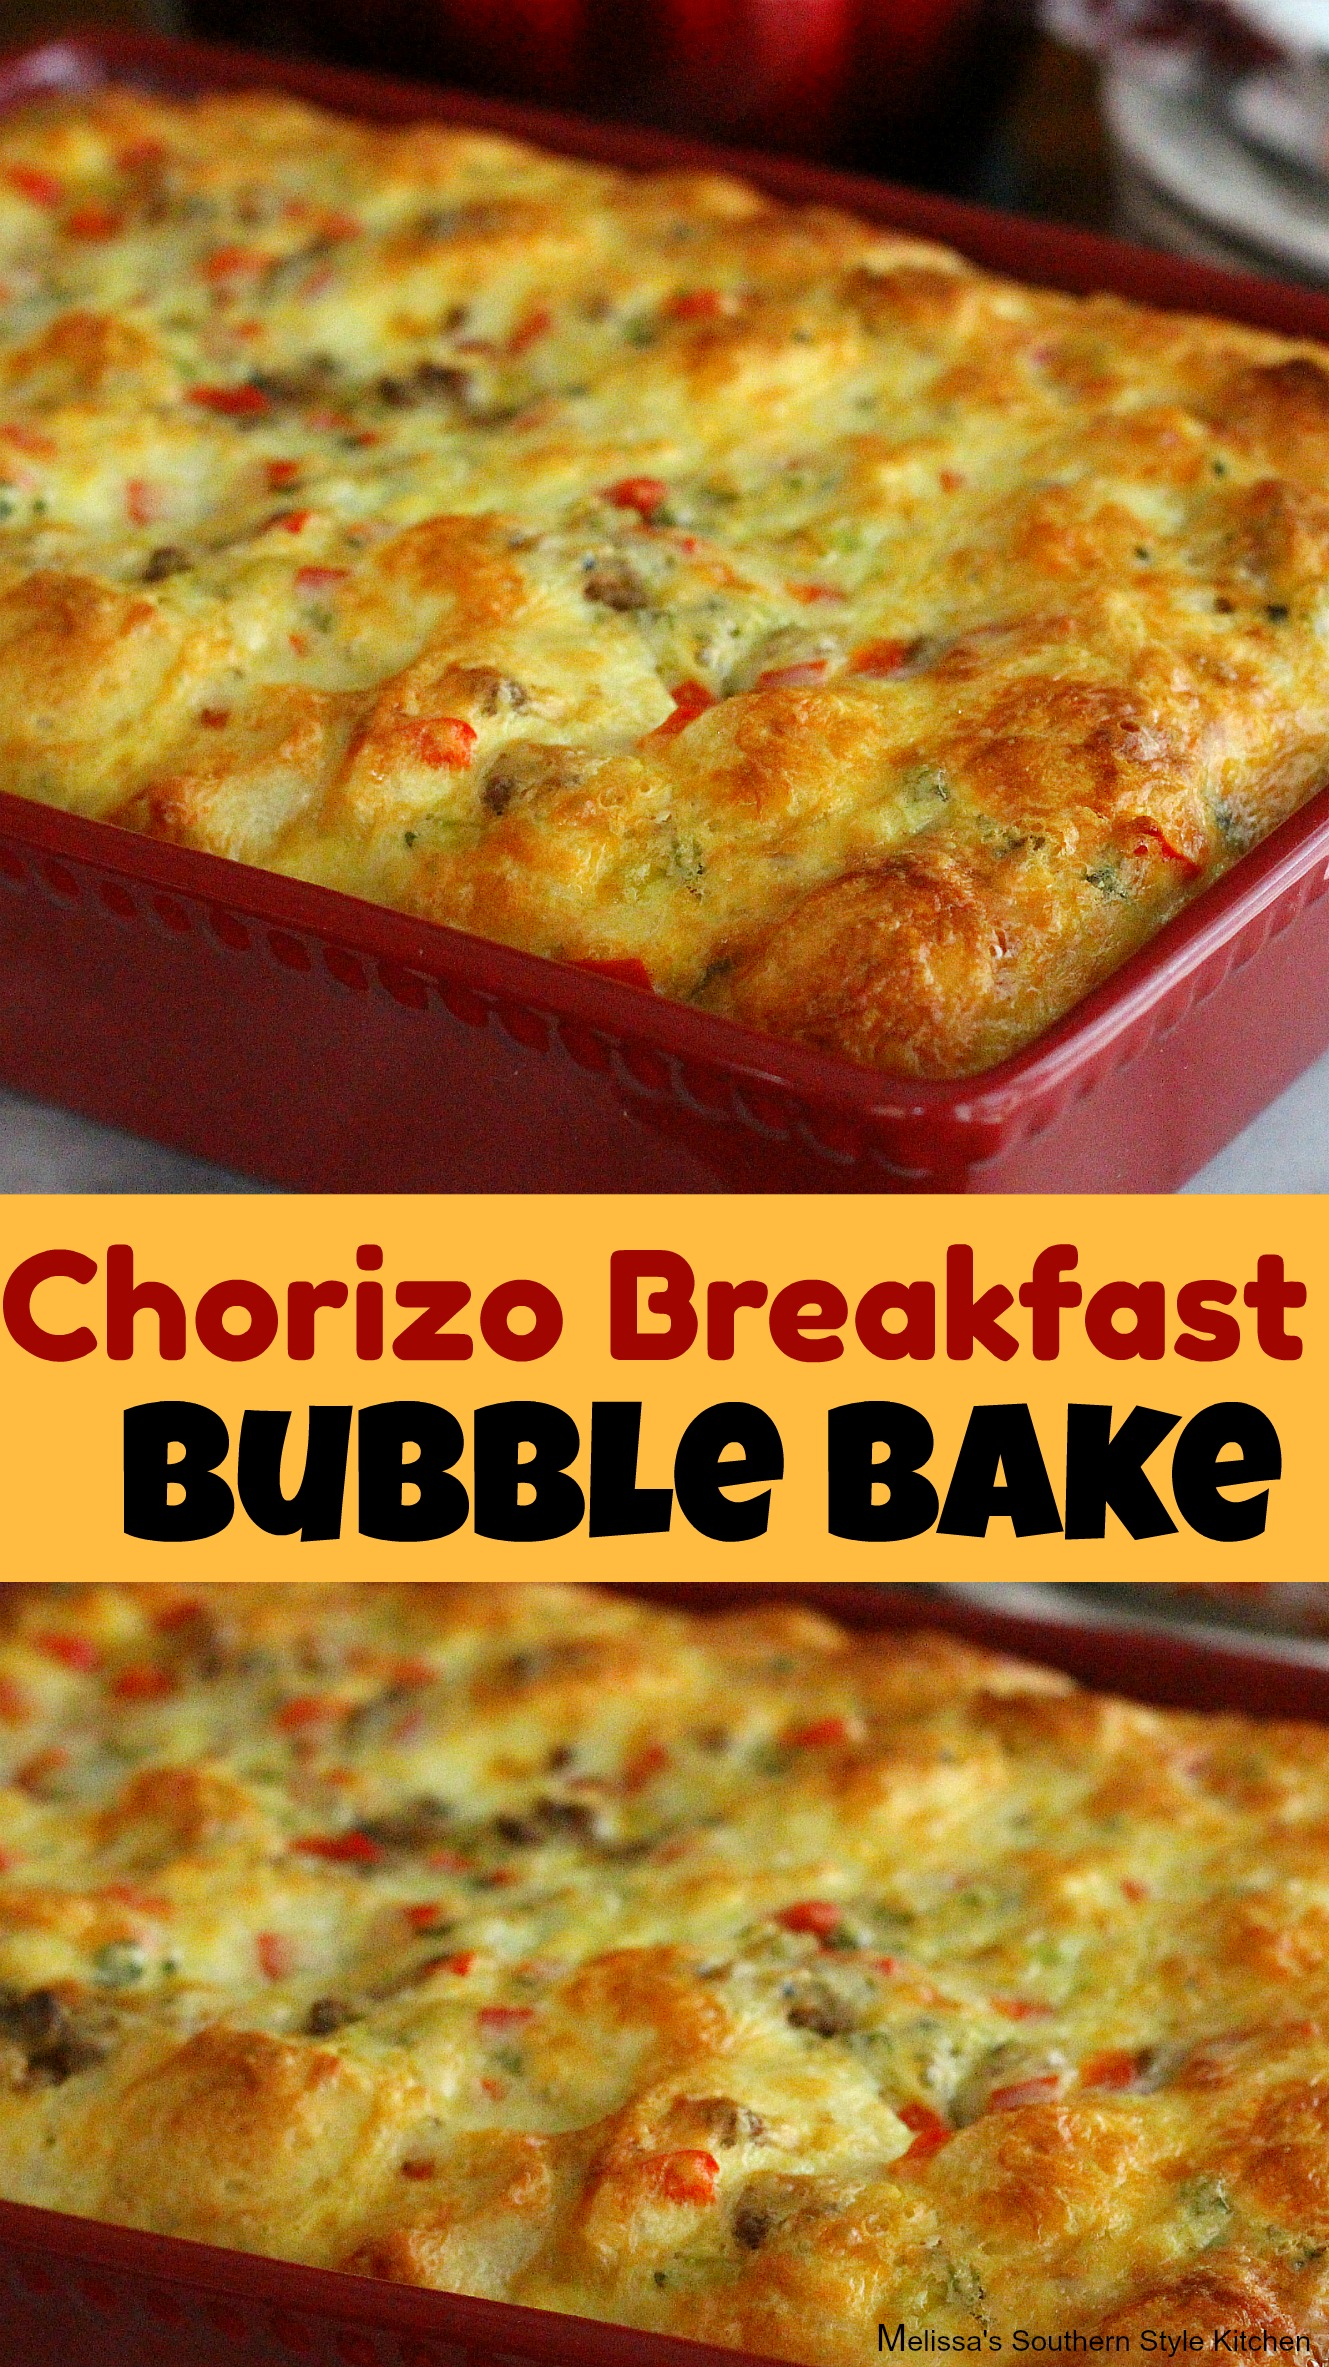 Chorizo Breakfast Bubble Bake